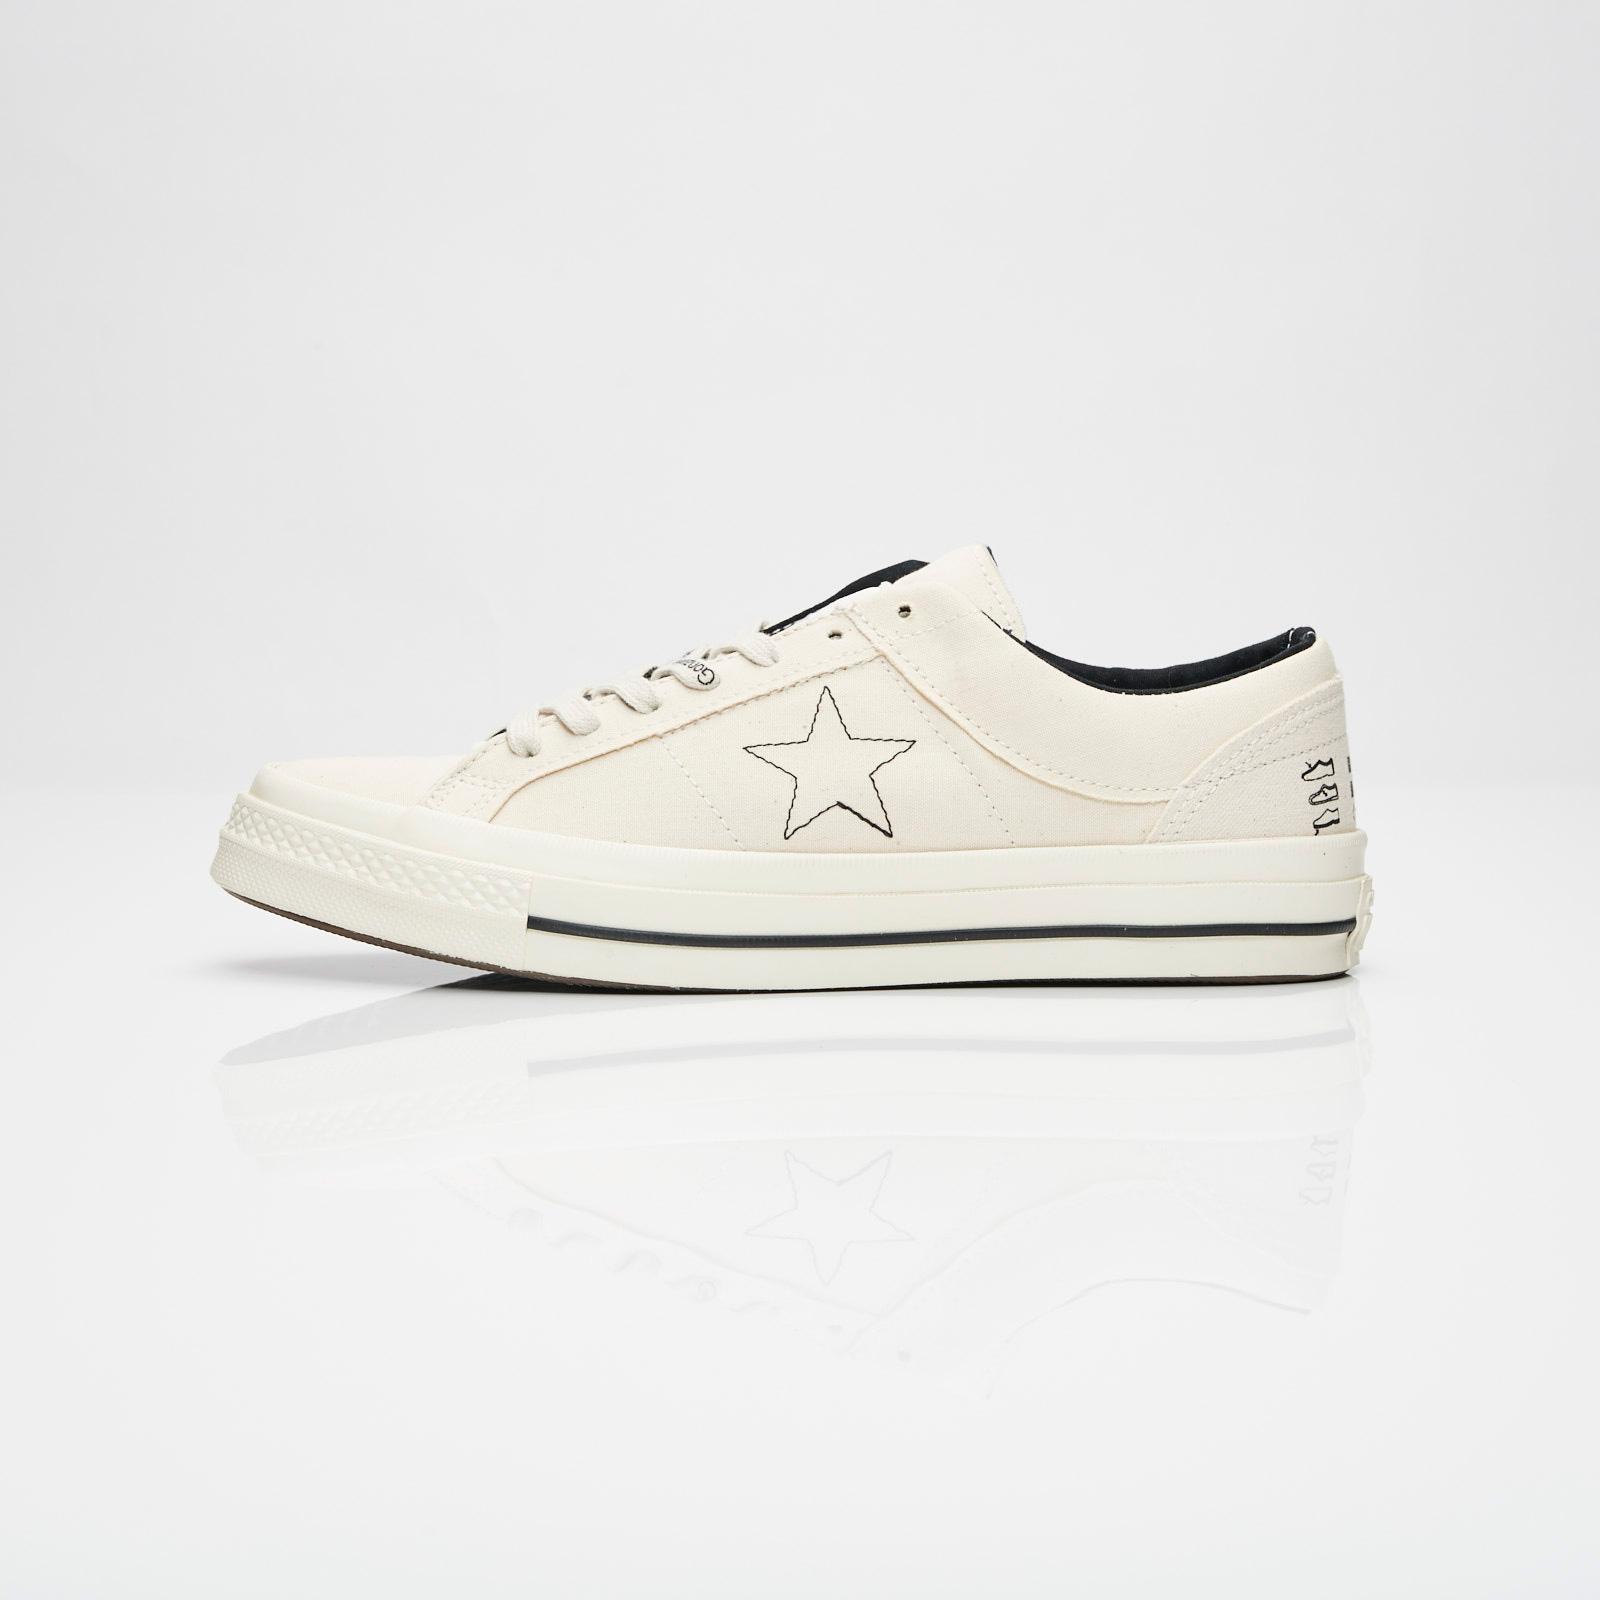 4873efdc97aa Converse One Star x Midnight Studio - 162124c - Sneakersnstuff ...